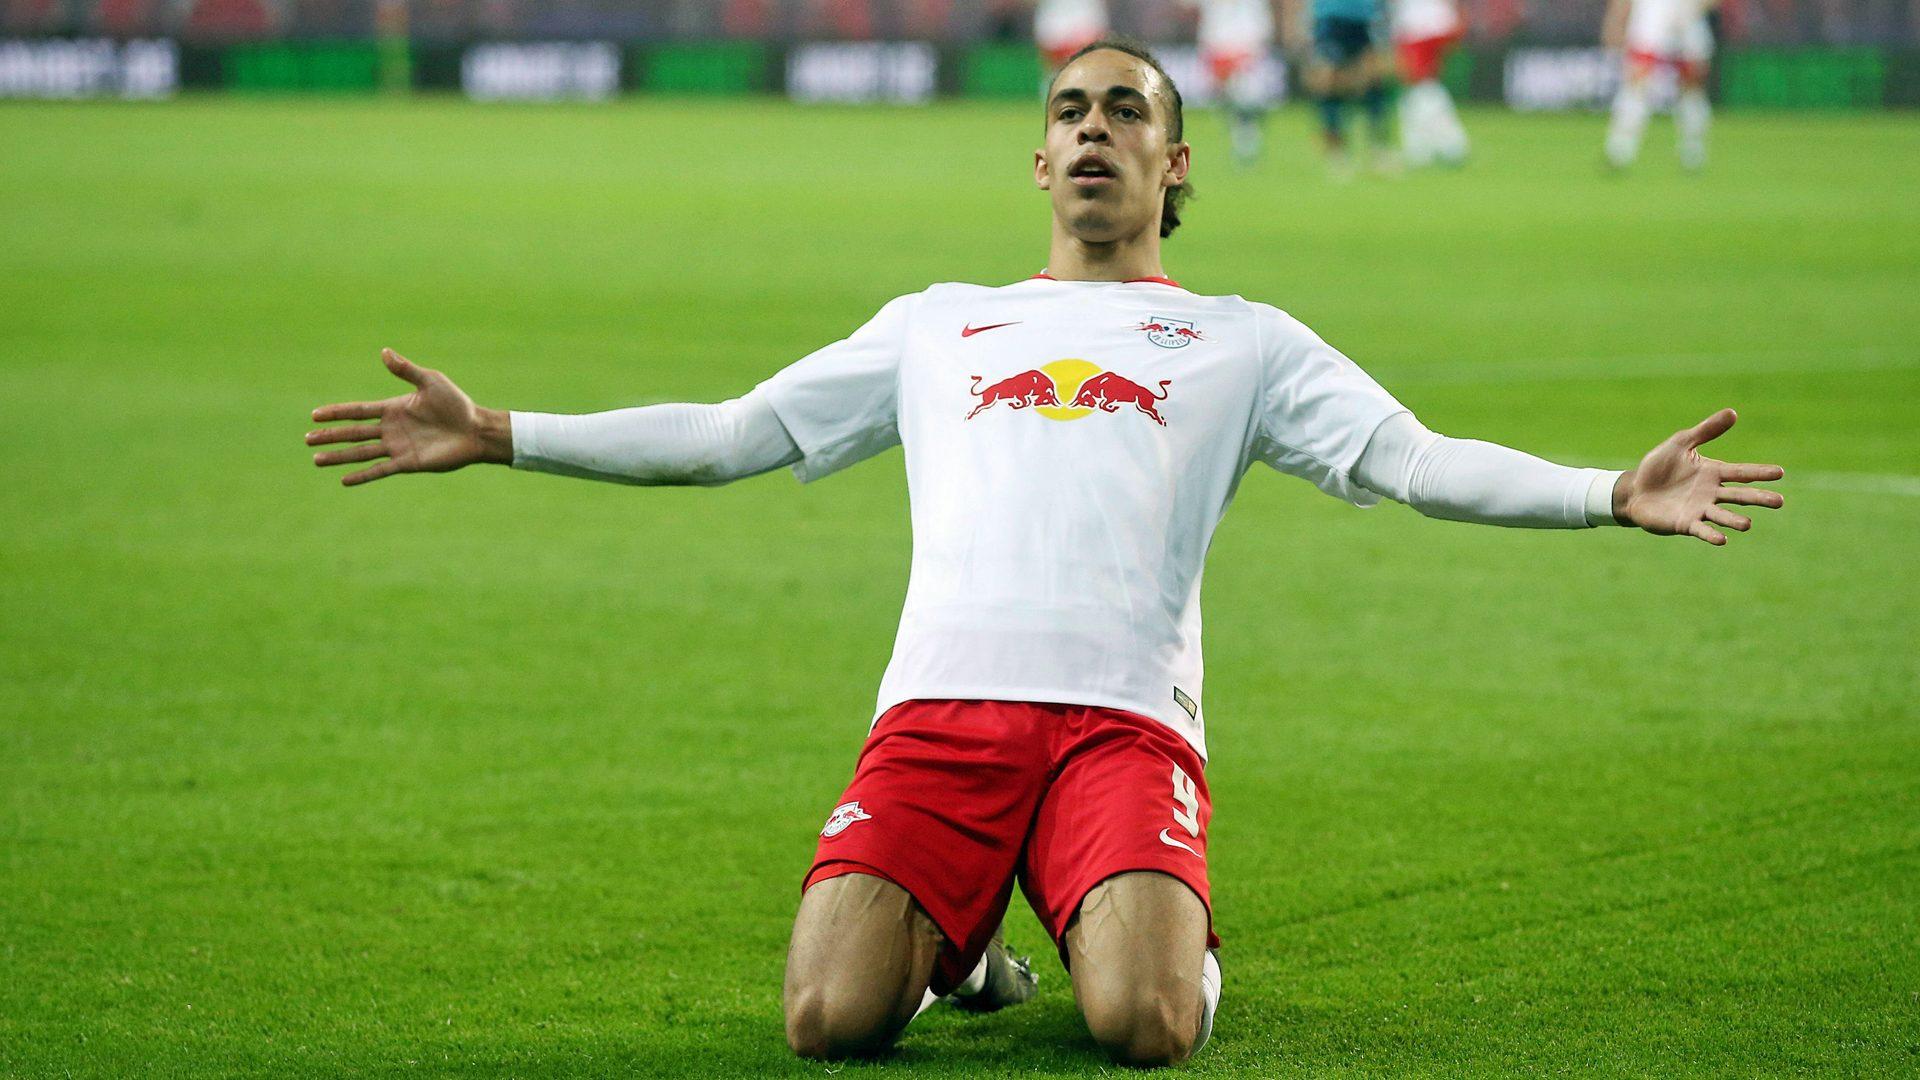 Bundesliga | Is RB Leipzig's Yussuf Poulsen the Bundesliga's most underrated player?